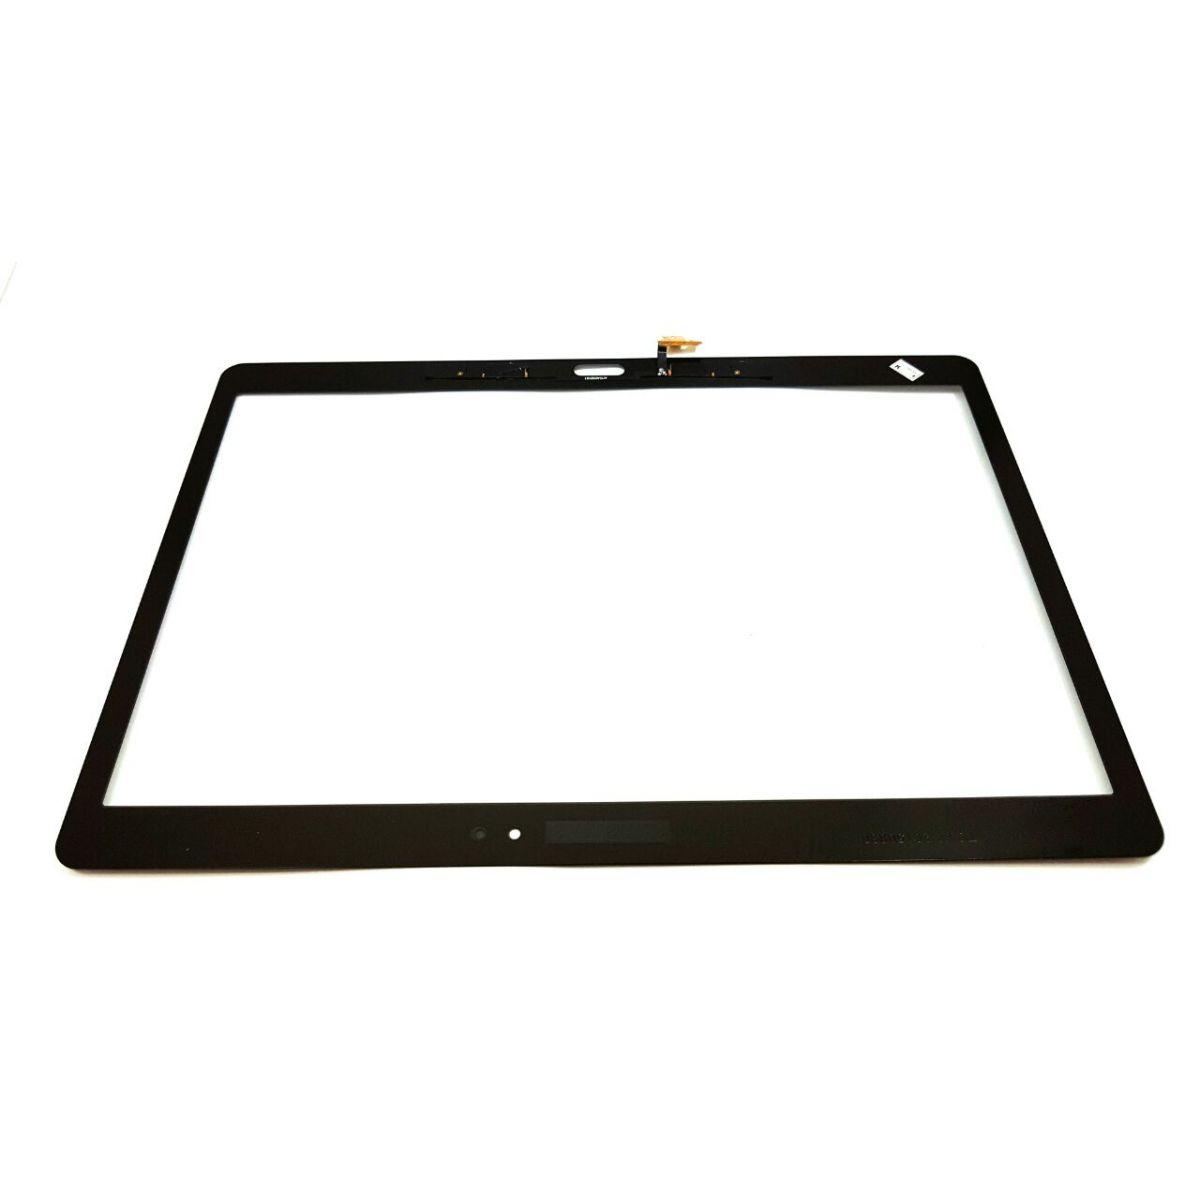 Touch Samsung Tablet Samsung Tab S T800 T805 Grafite 10.5 Aplicacao com UV